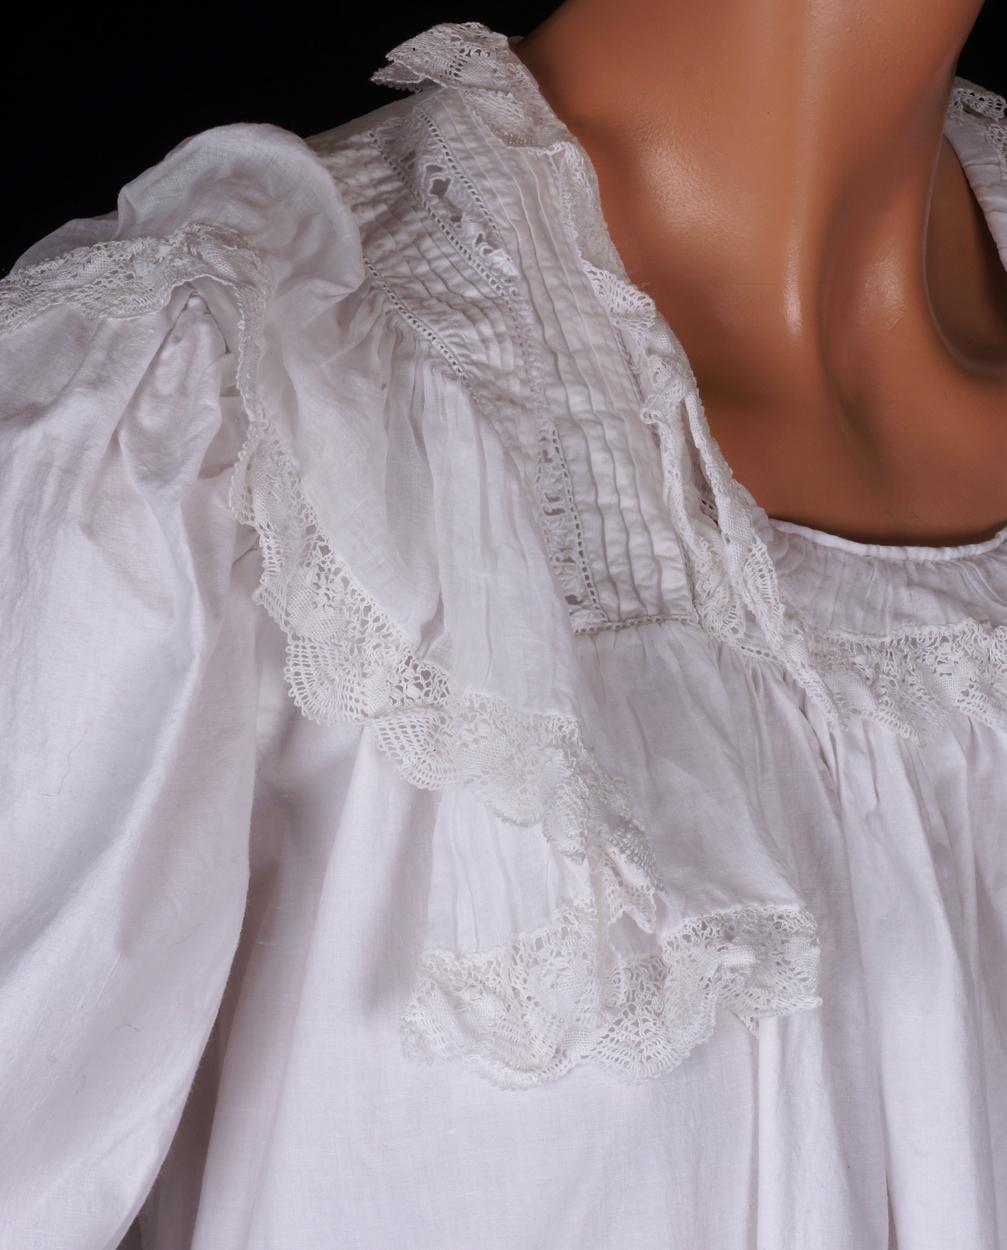 Antique Victorian Nightgown 19th C White Cotton Eyelet